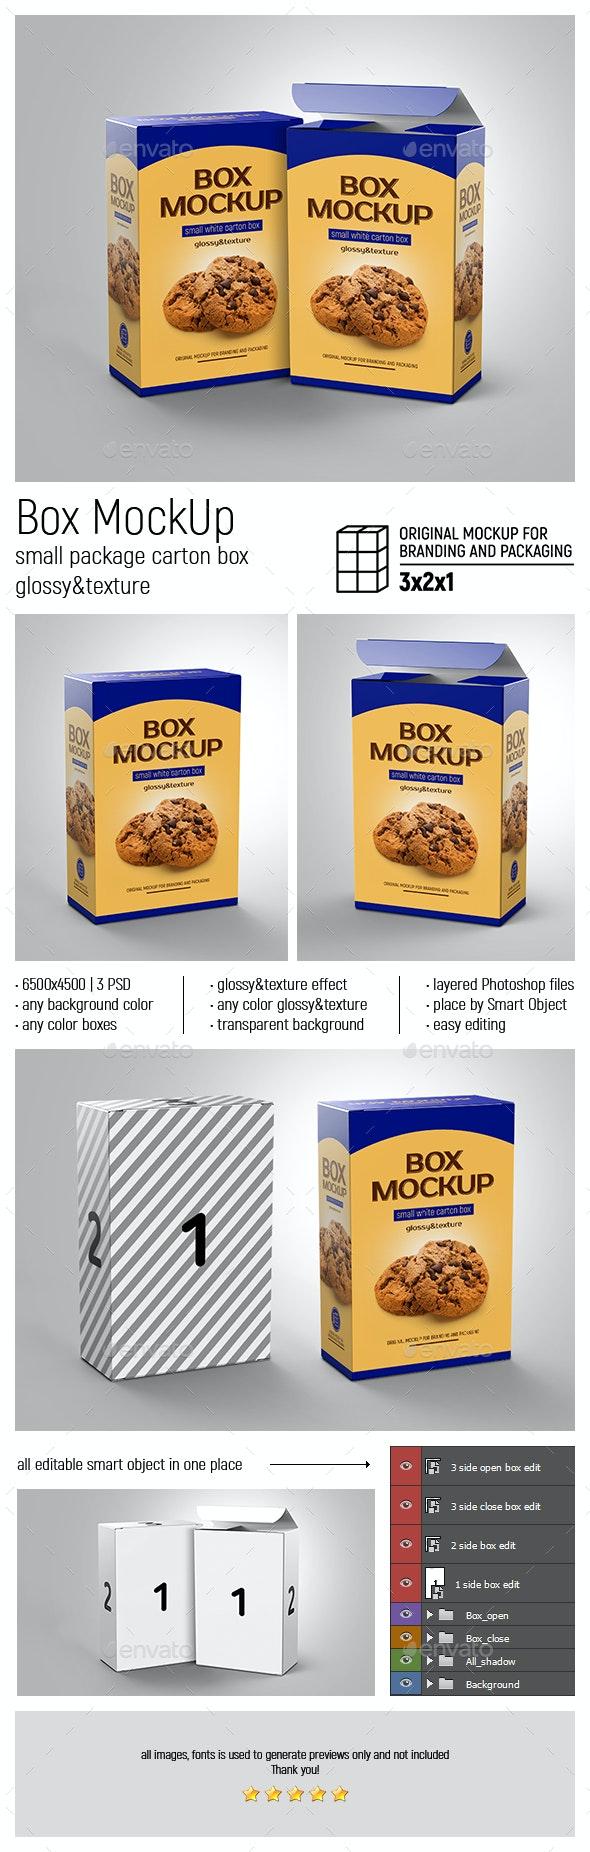 Box MockUp Glossy and Texture - Product Mock-Ups Graphics